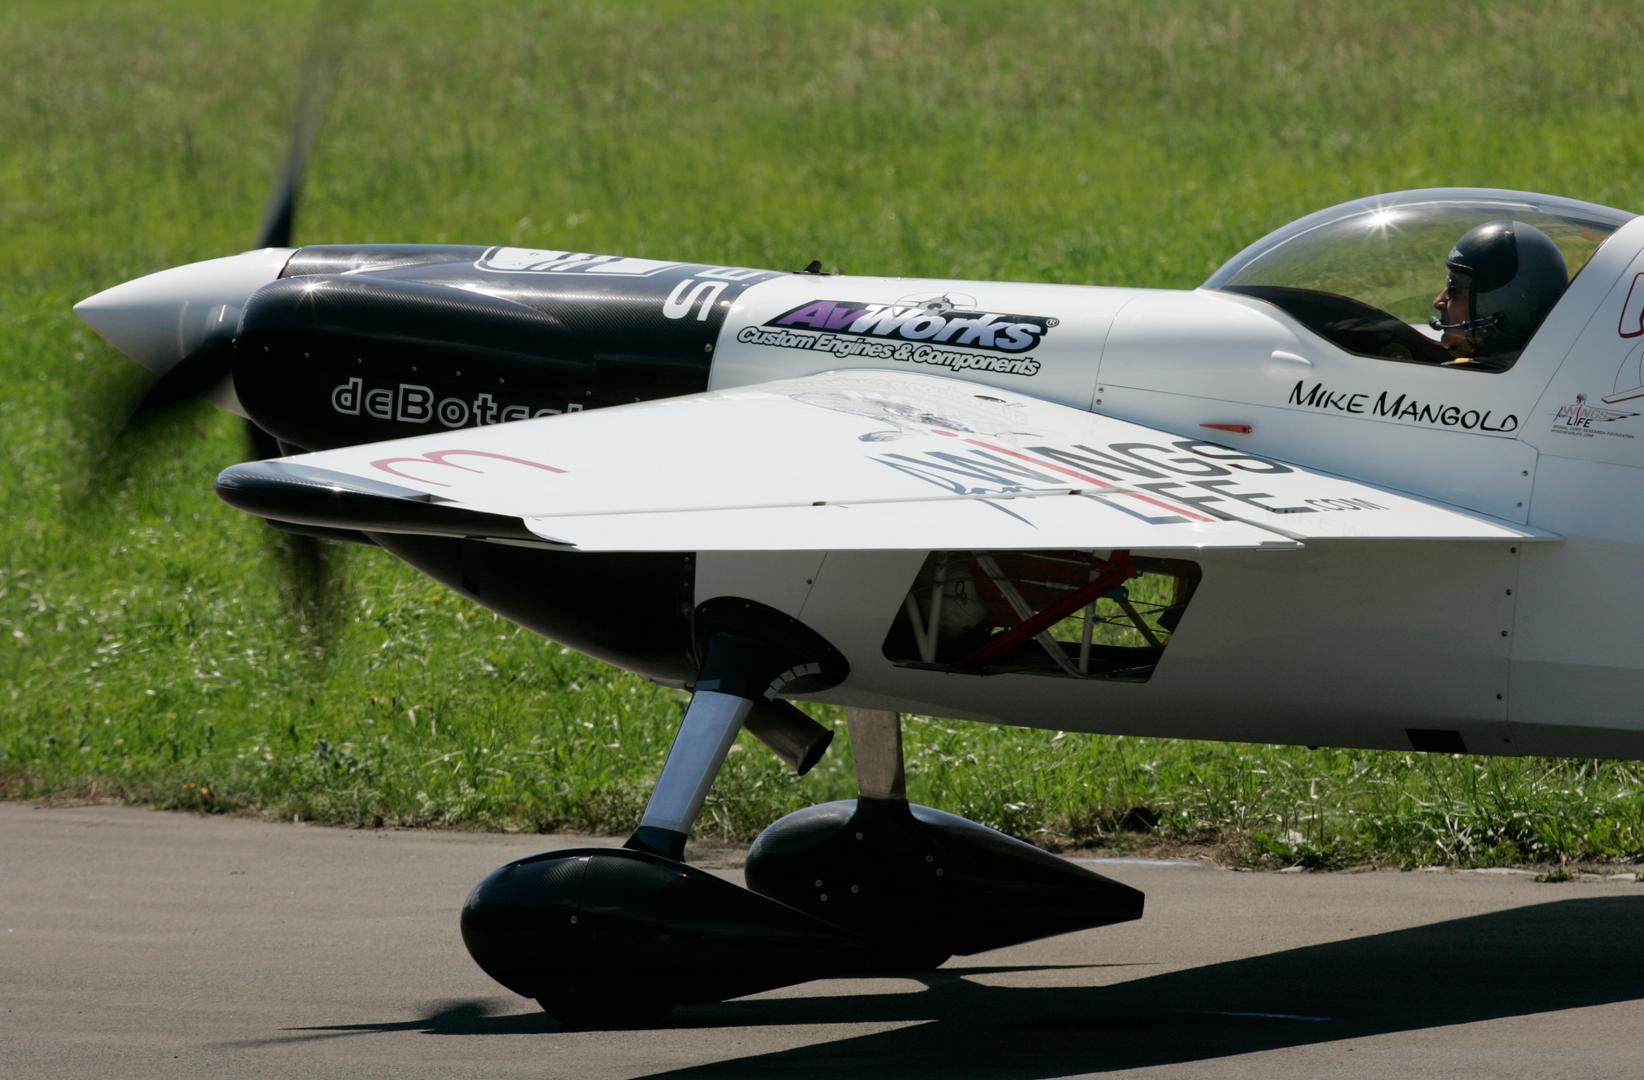 Mike Mangold carbon fiber debotech plane